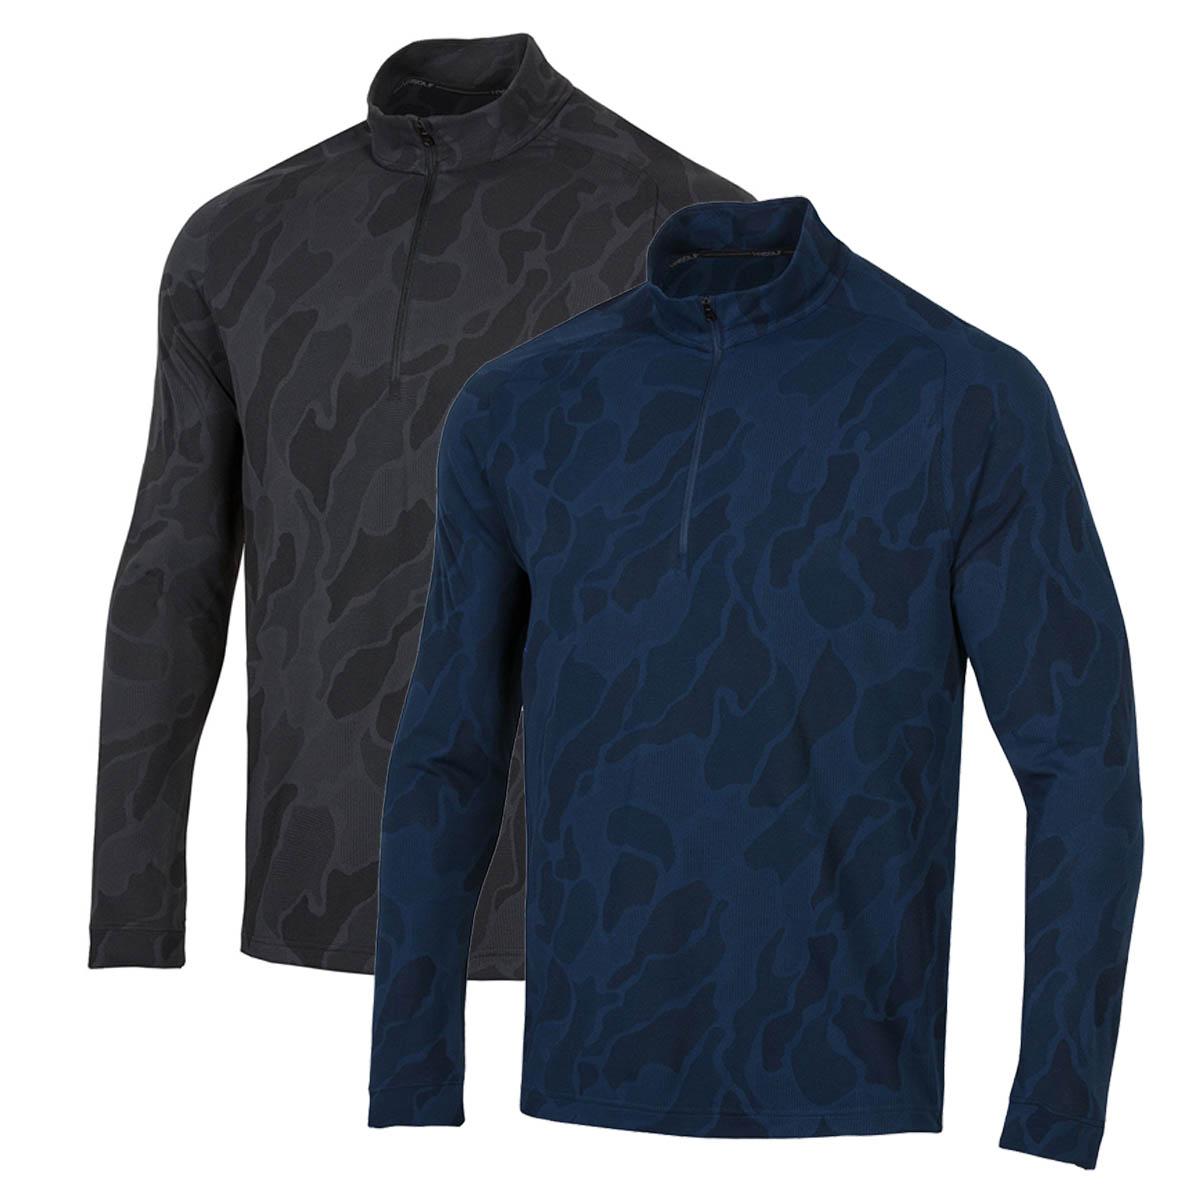 Under Armour Men's Vanish Diverge 1/4 Zip Pullover